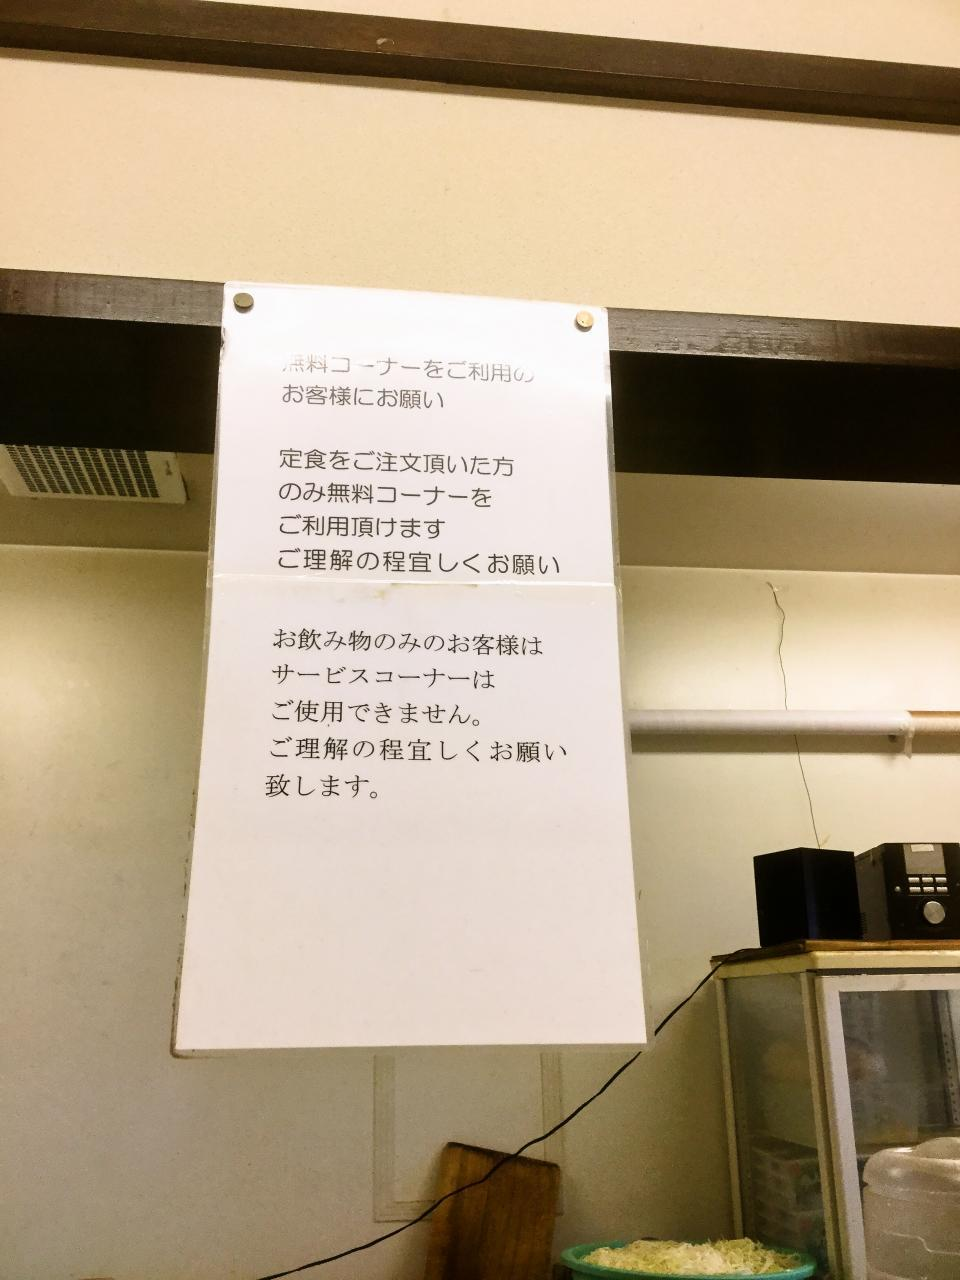 激安食堂 小林屋(漬け物)